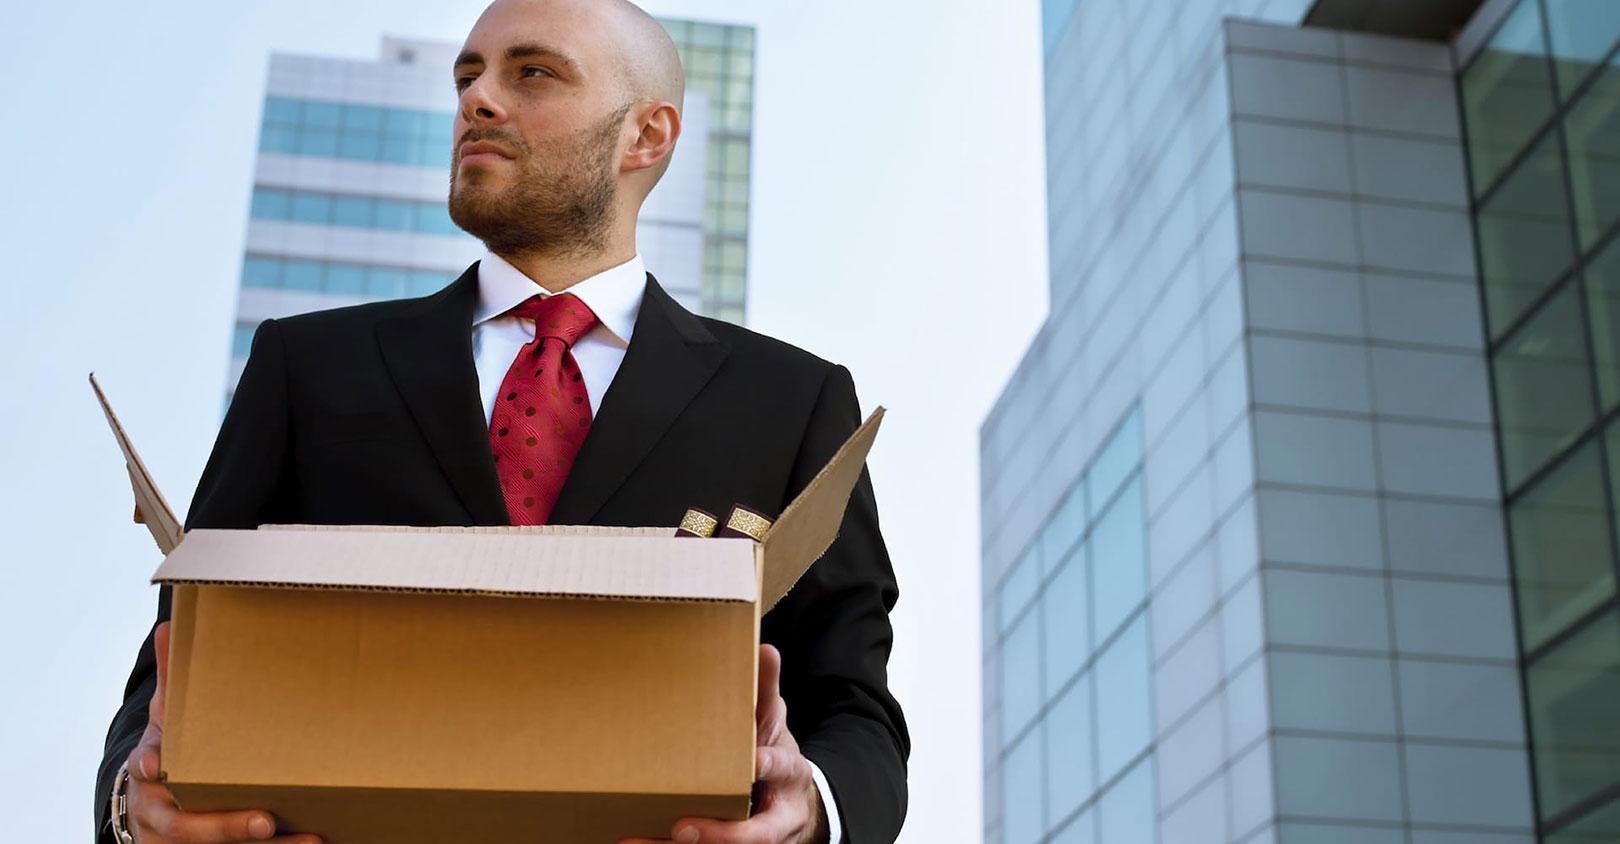 Toronto Employment Lawyers Lecker and Associates